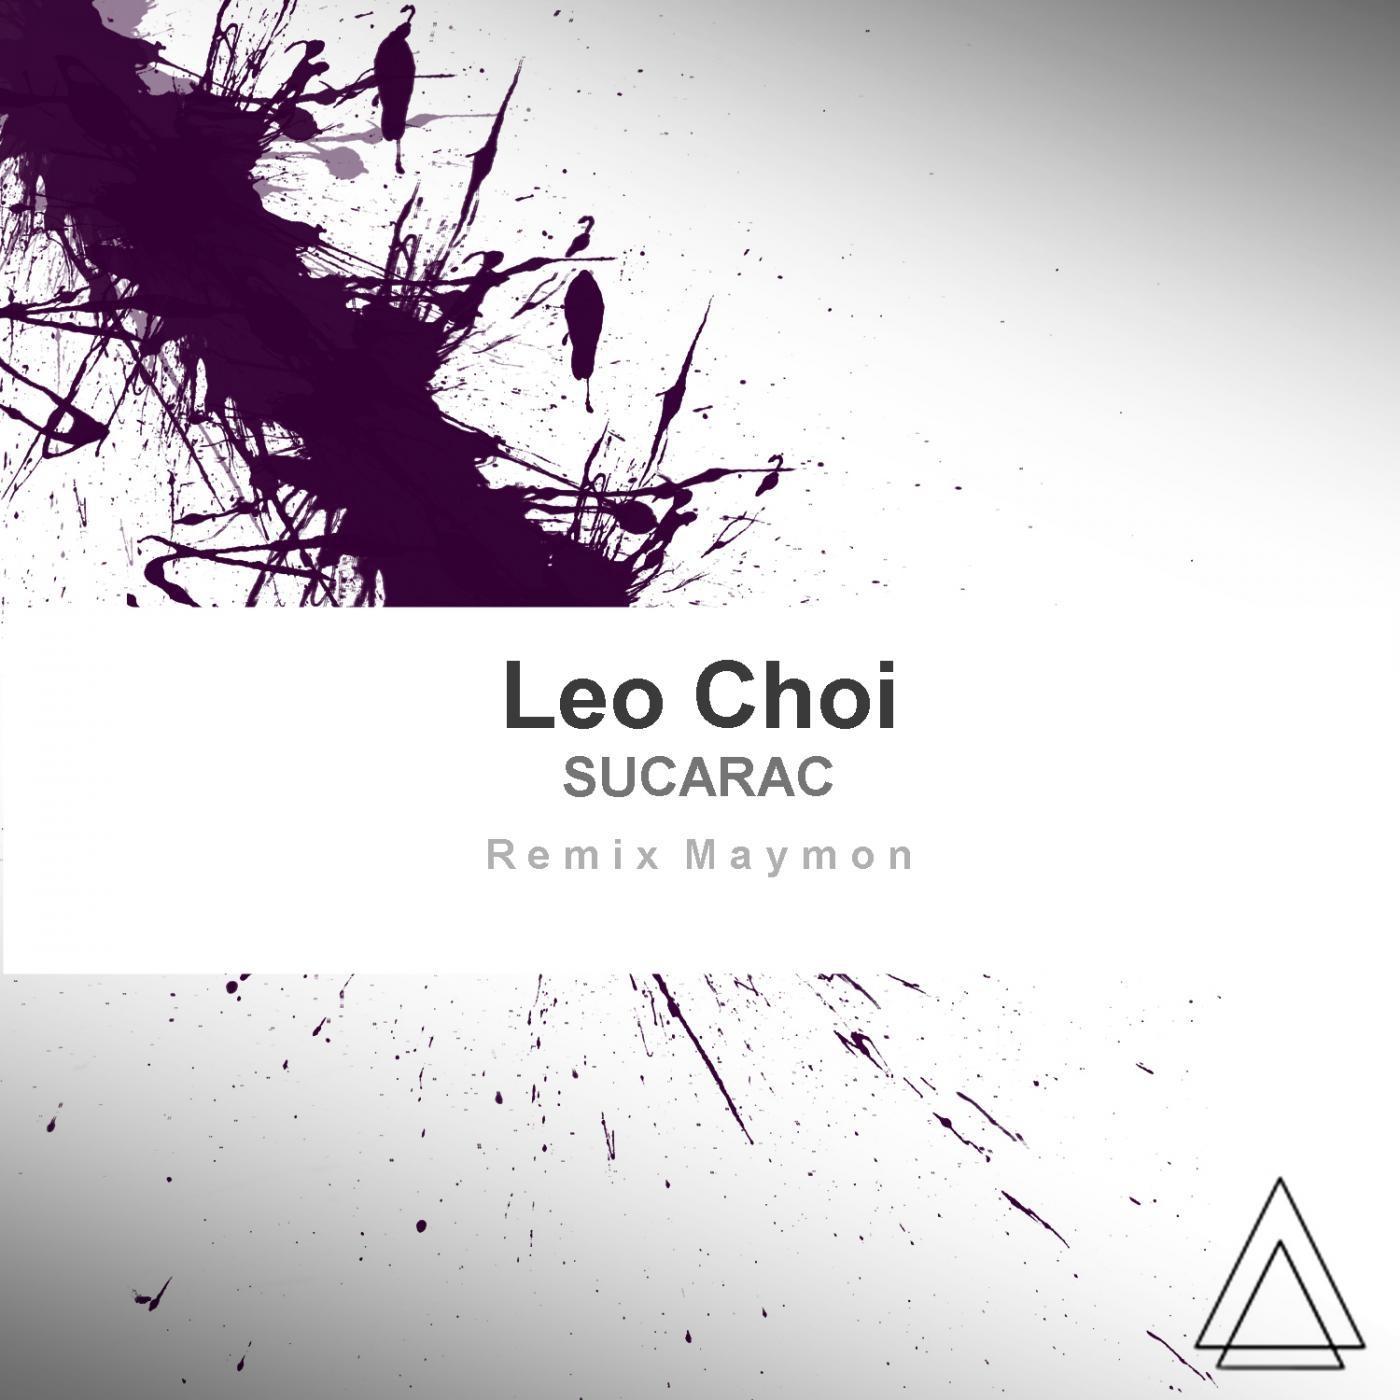 Leo Choi - Sucarac (Original mix)